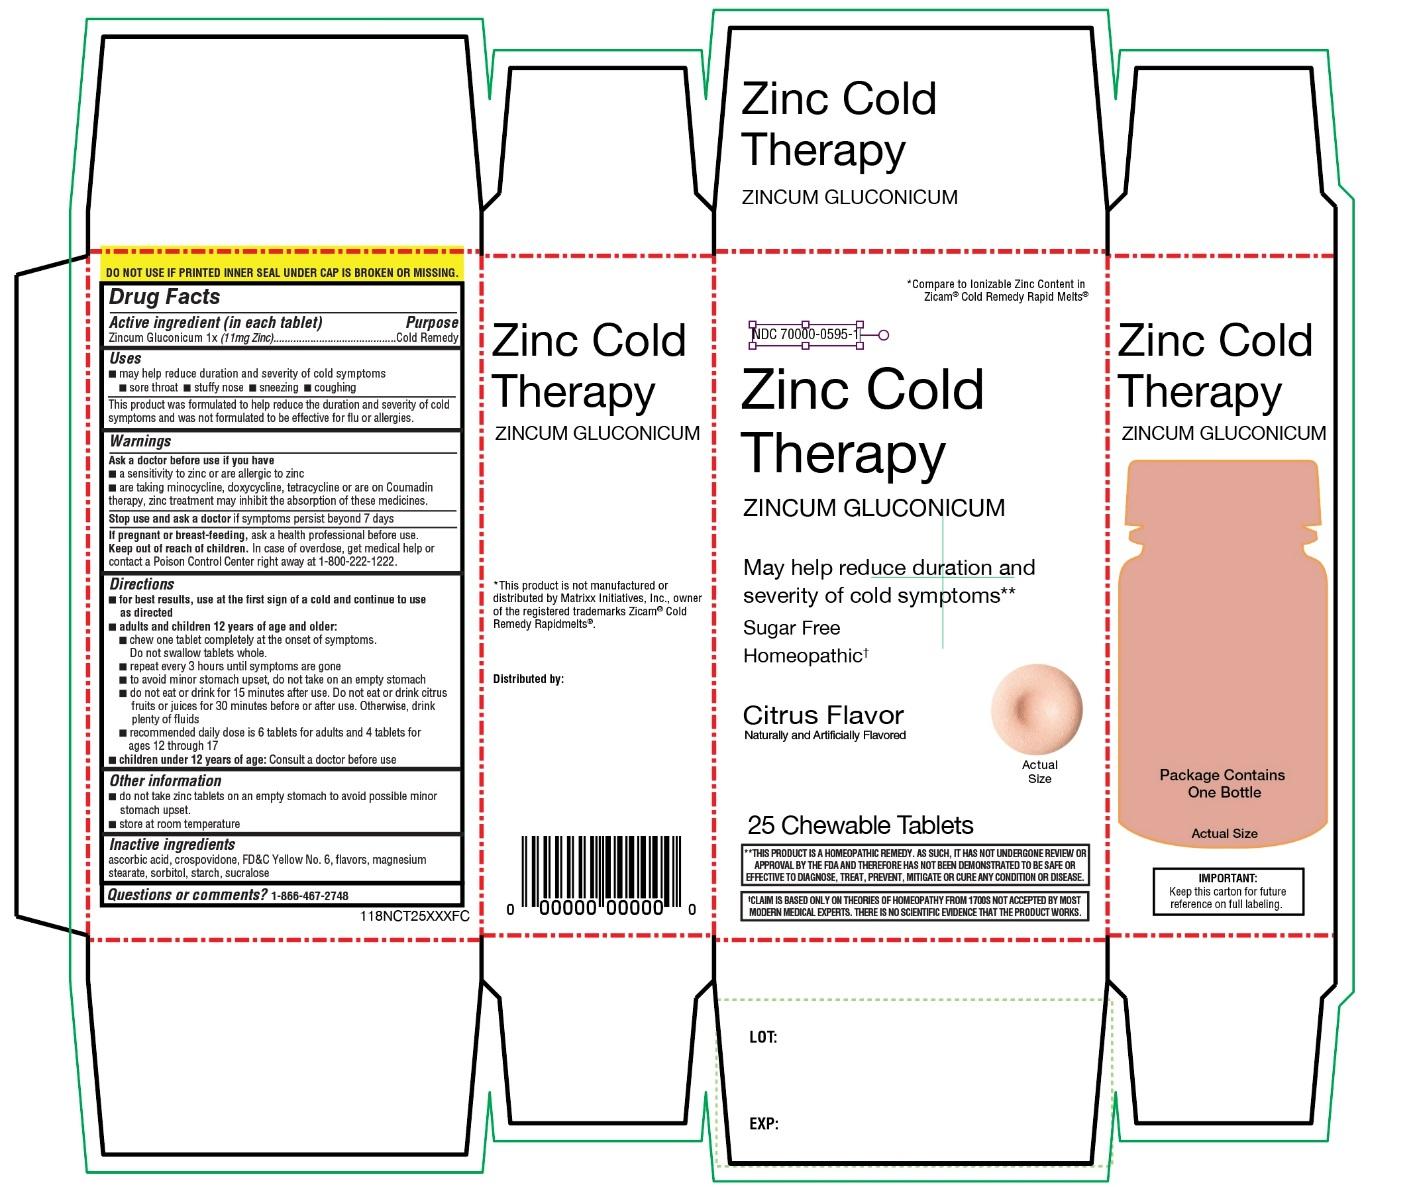 Leader zinc cold therapy Zincum Gluconicum citrus flavor